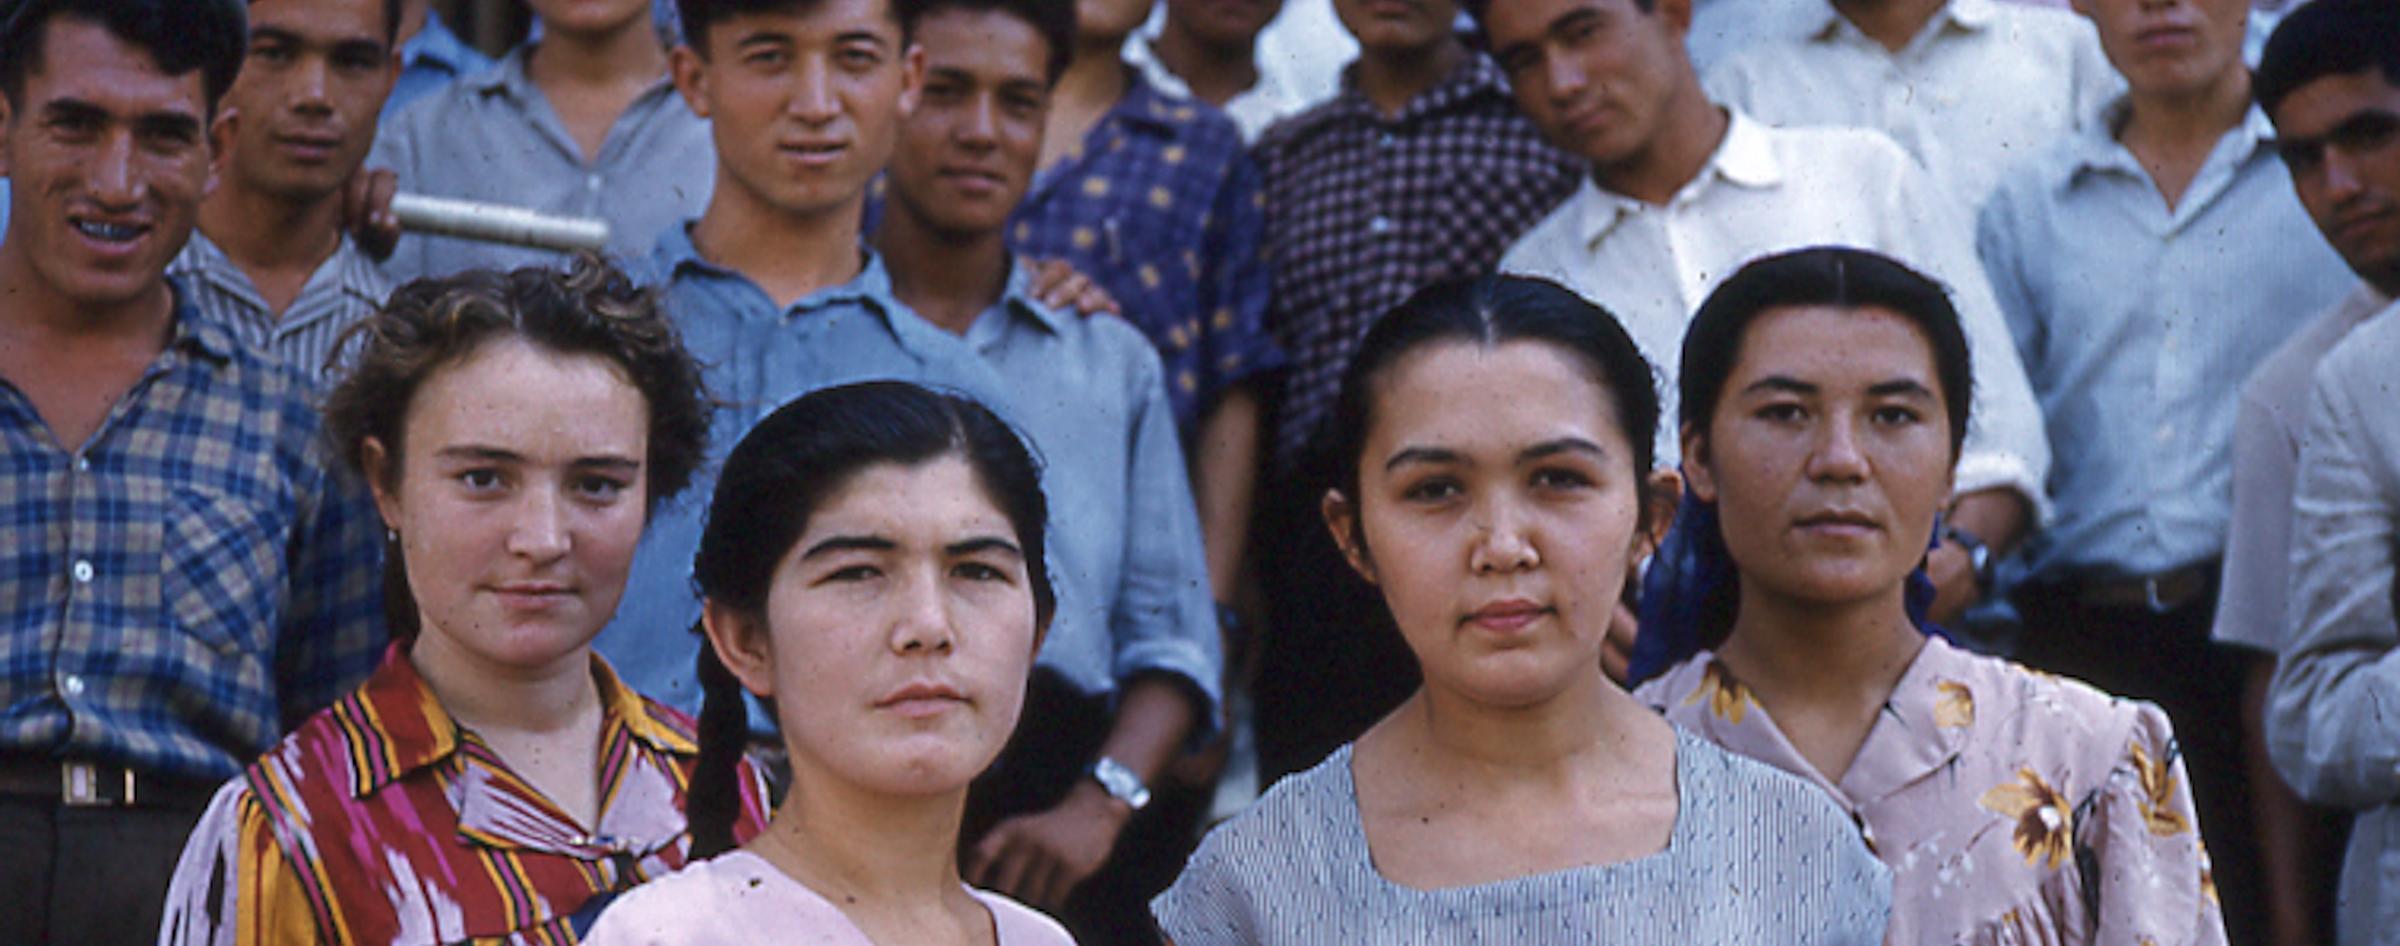 1961Tashkent Students T16 058 header image